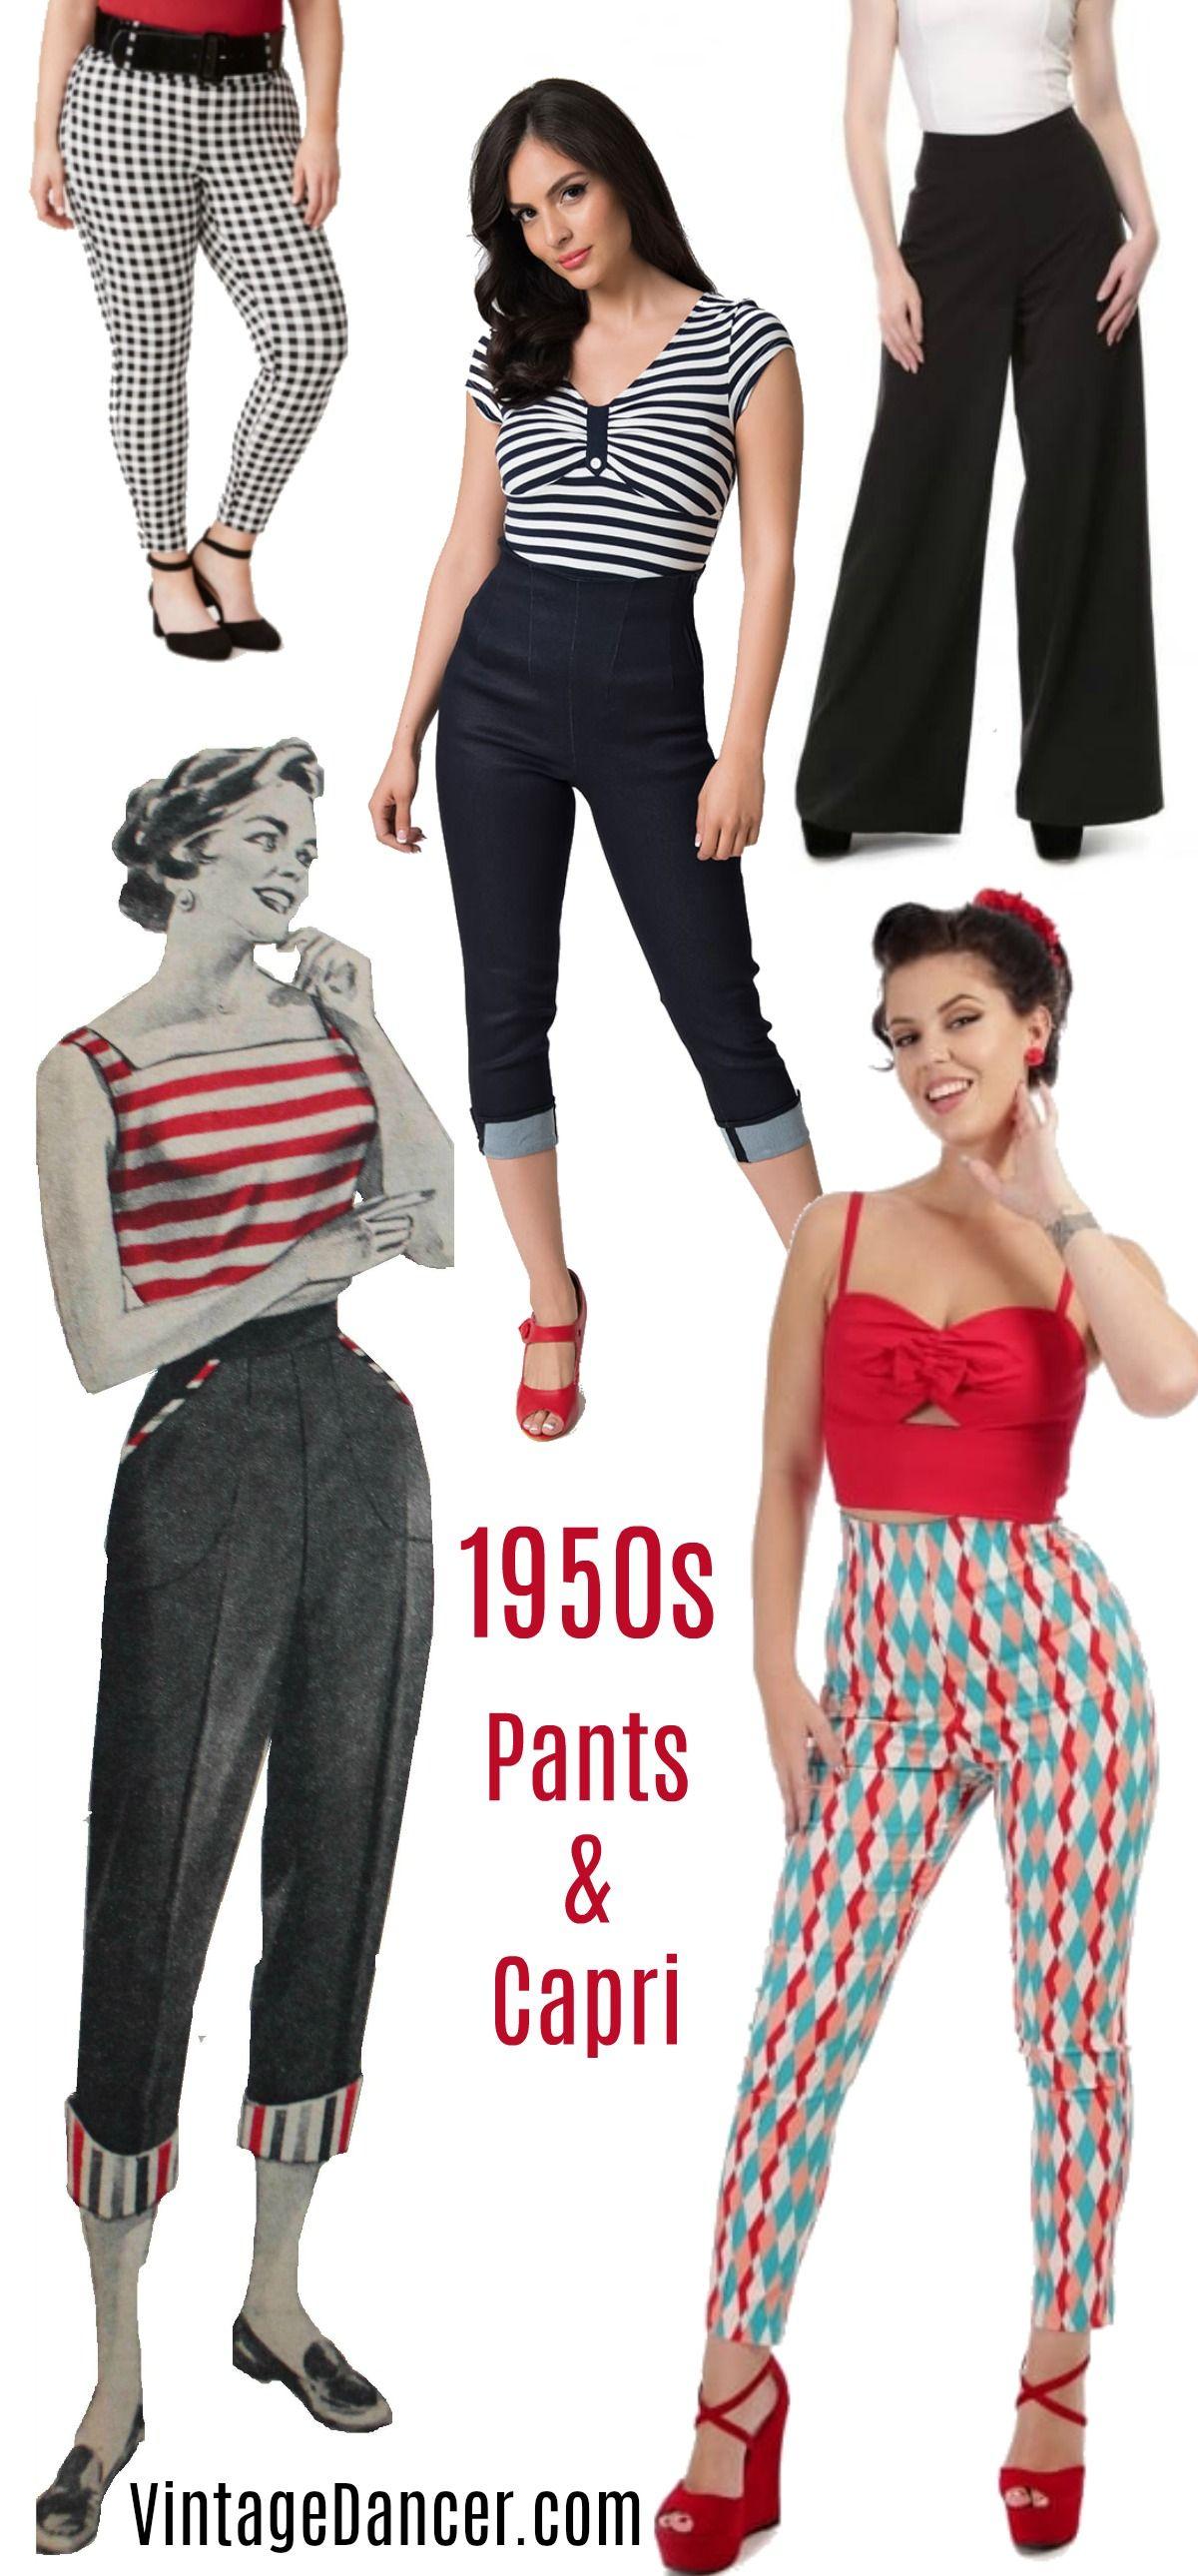 1950s Pants & Jeans- High Waist, Wide Leg, Capri, Pedal